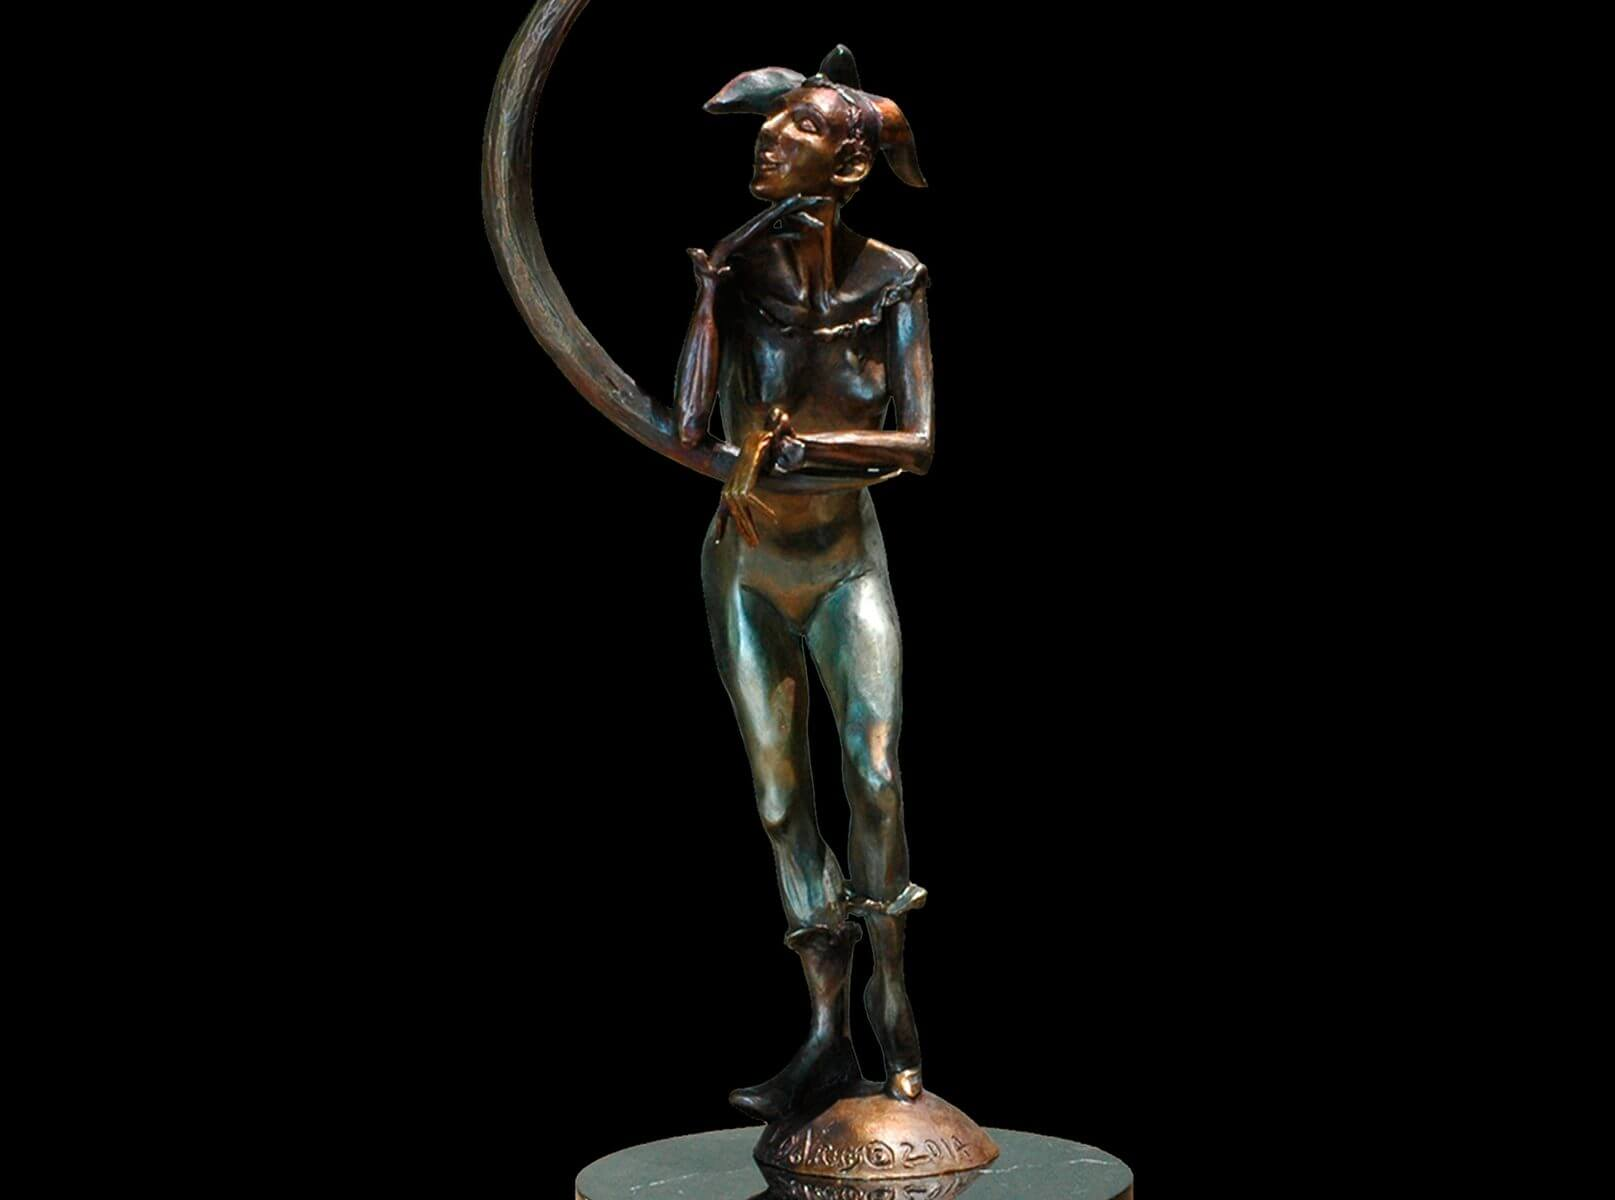 Moonlight a female bronze jester figurative sculpture by Andrew DeVries